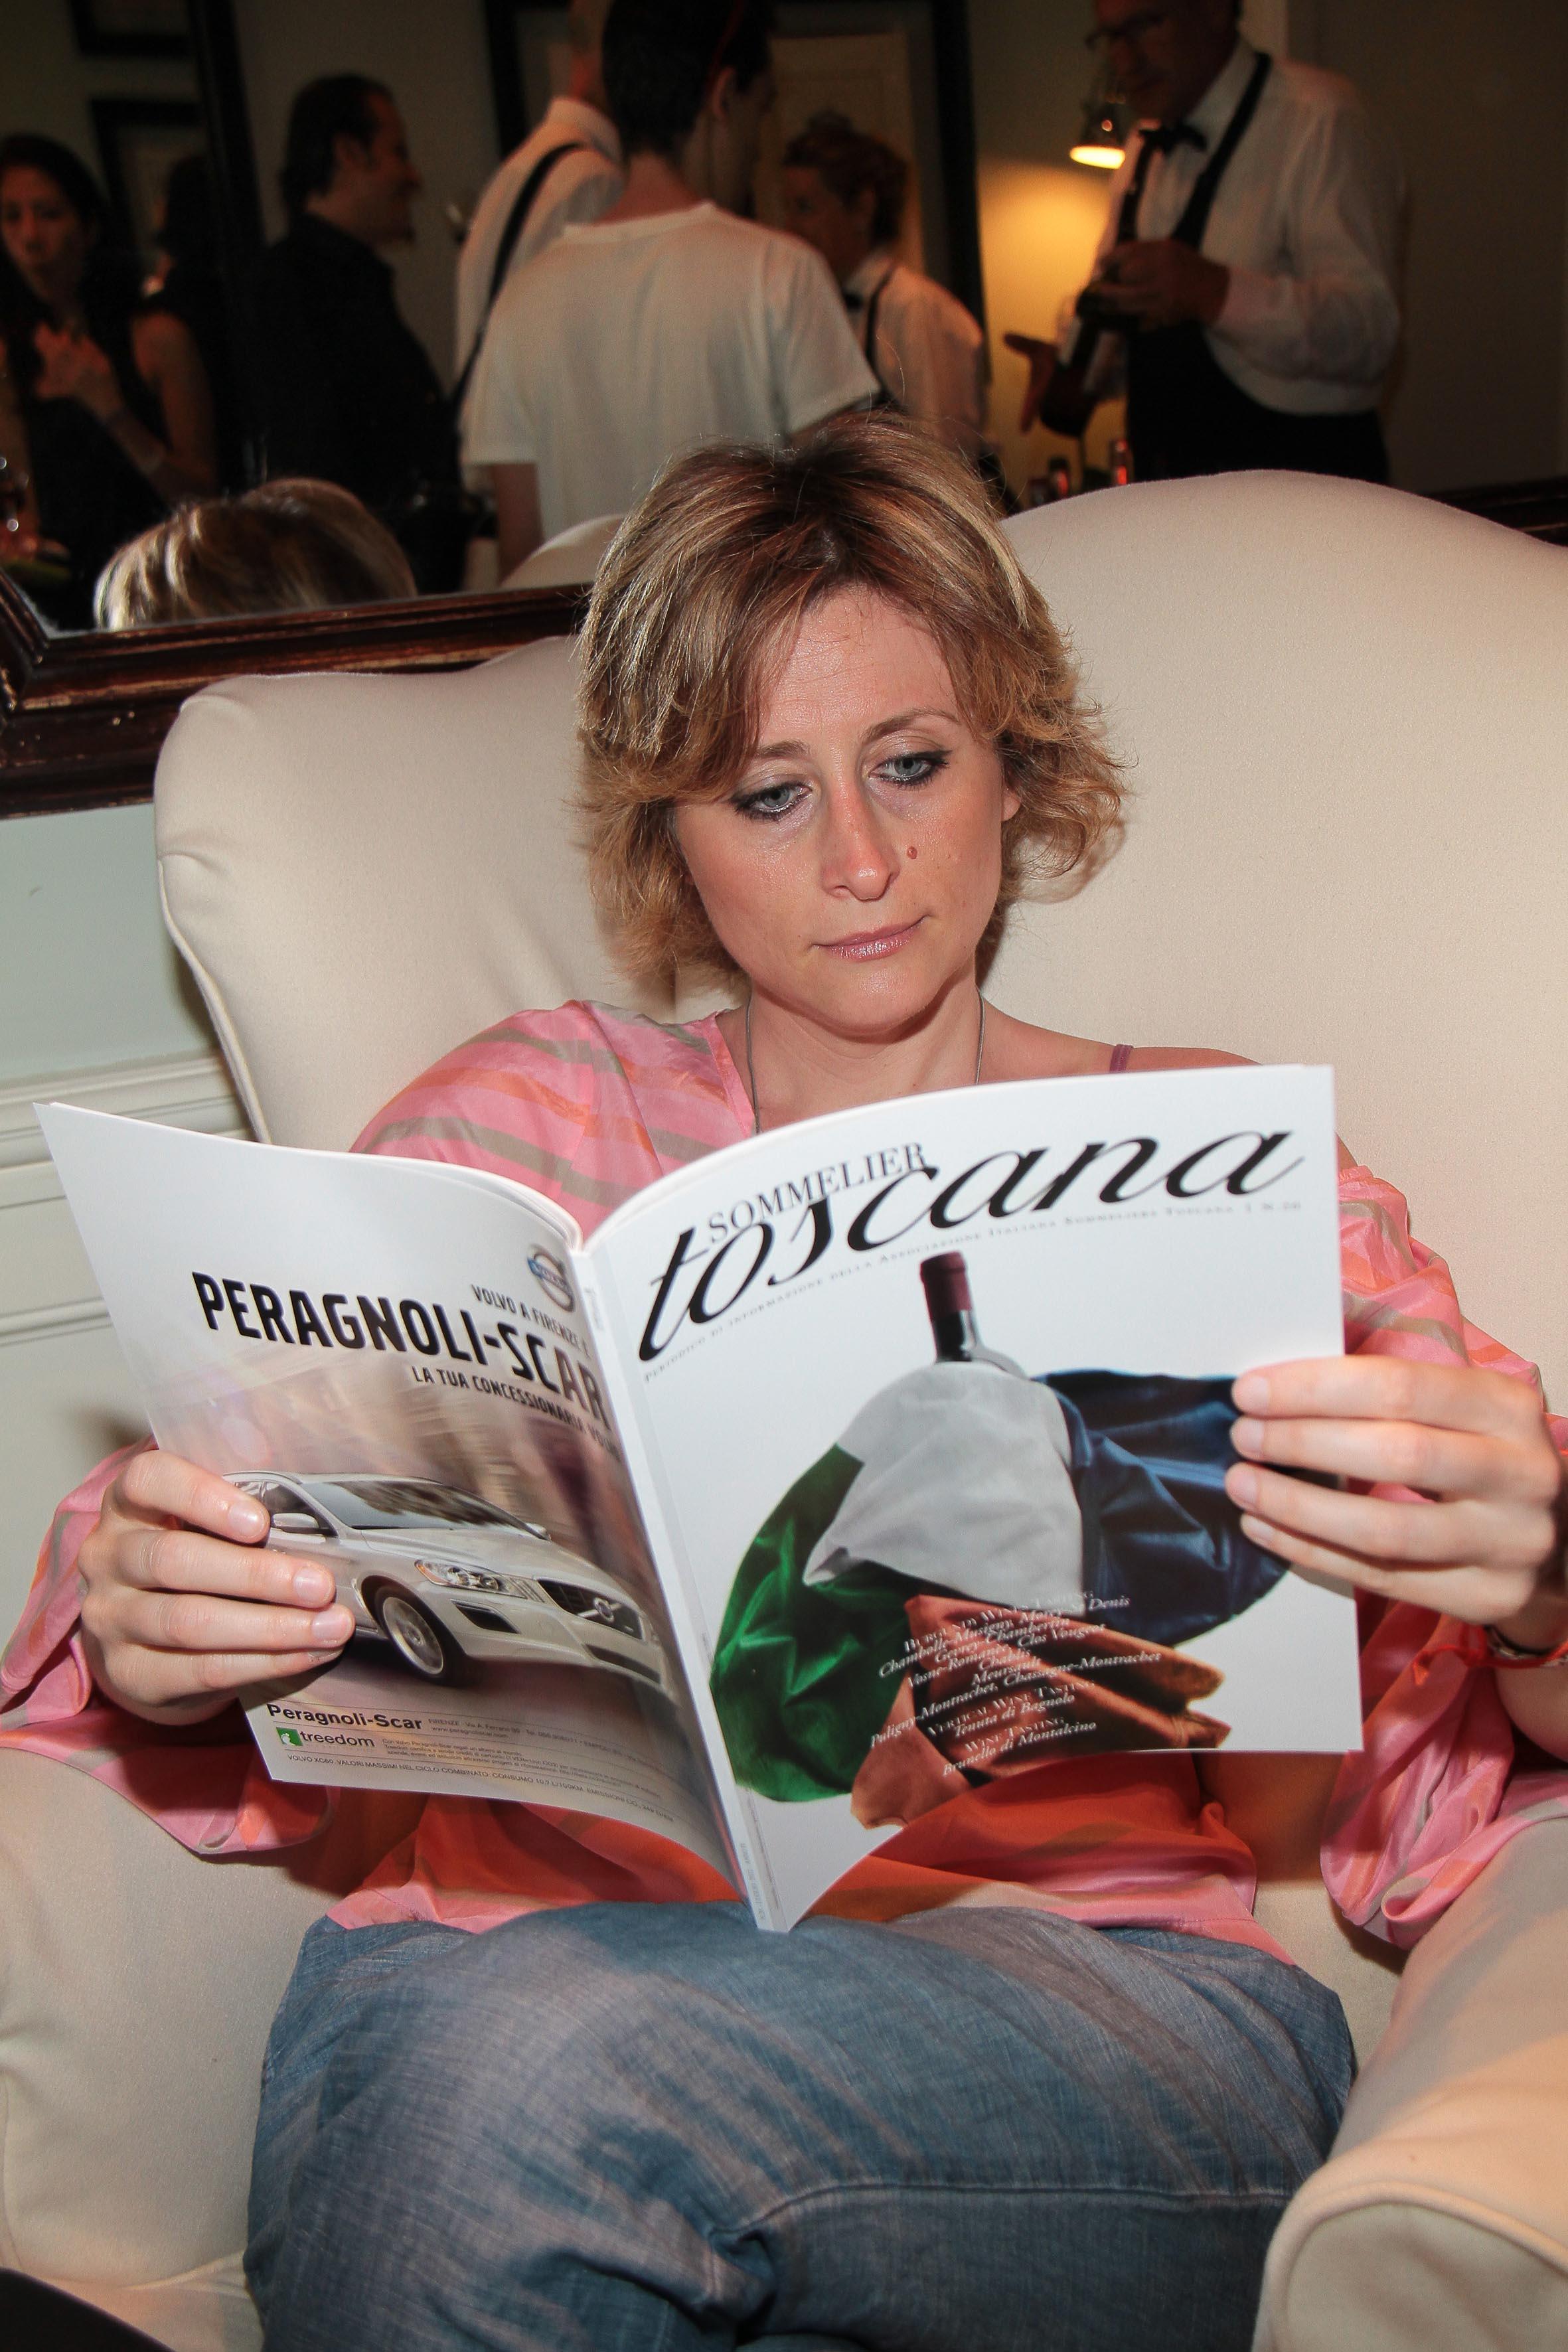 PRESSPHOTO Firenze, JK Place, Toscana Sommelier. Nella foto Sandra Salvato giuseppe cabras/new press photo